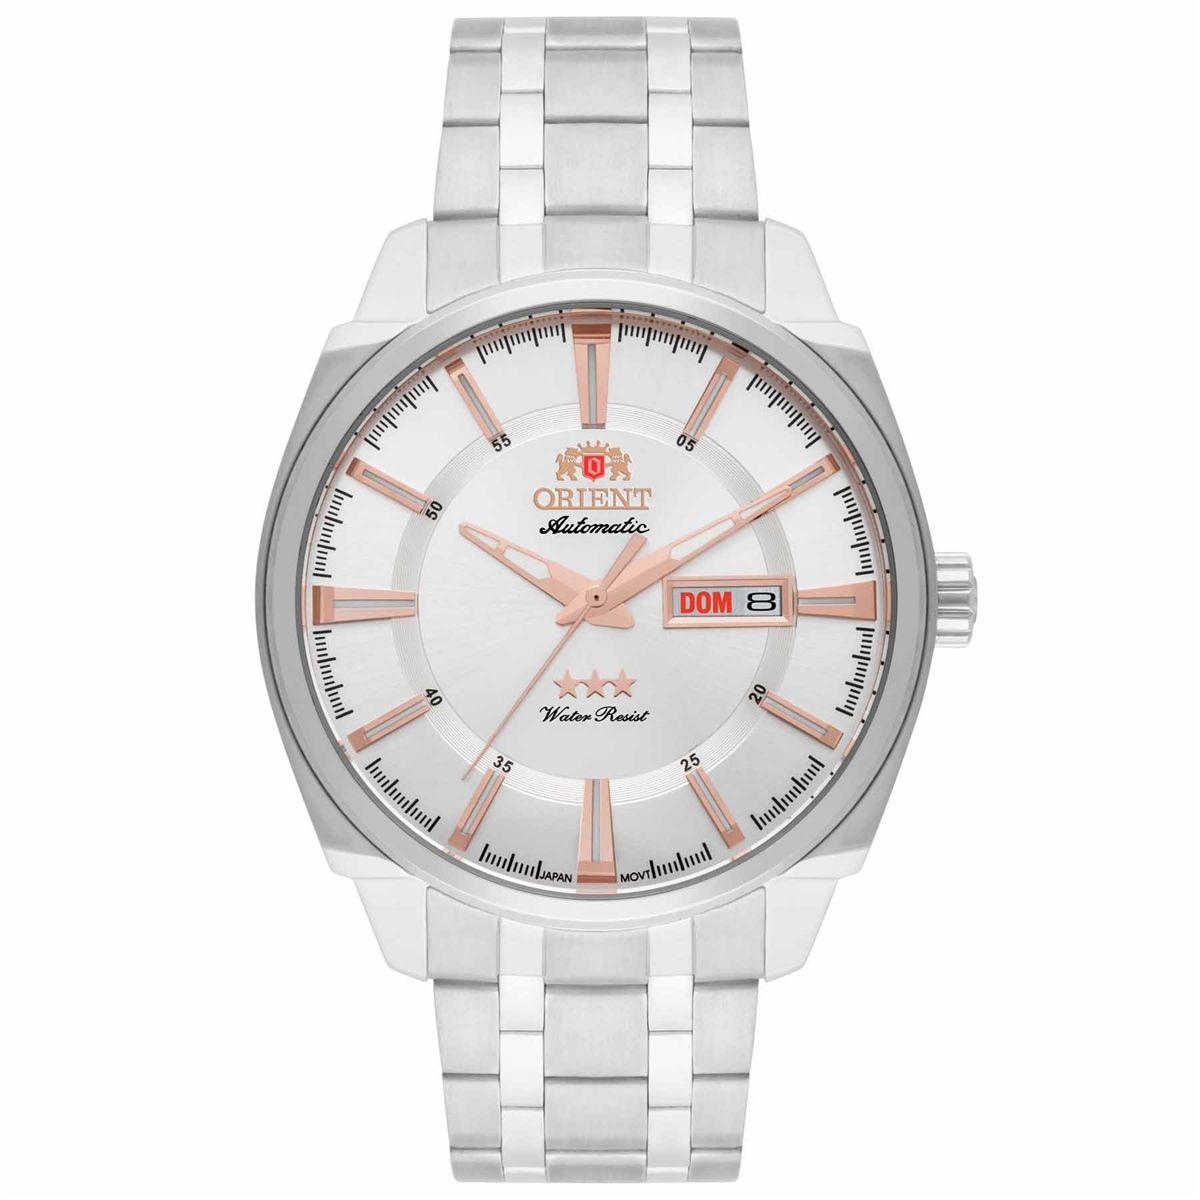 0a77d6976c8 Relógio Orient Automático Masculino 469ss072 S1sx Prata